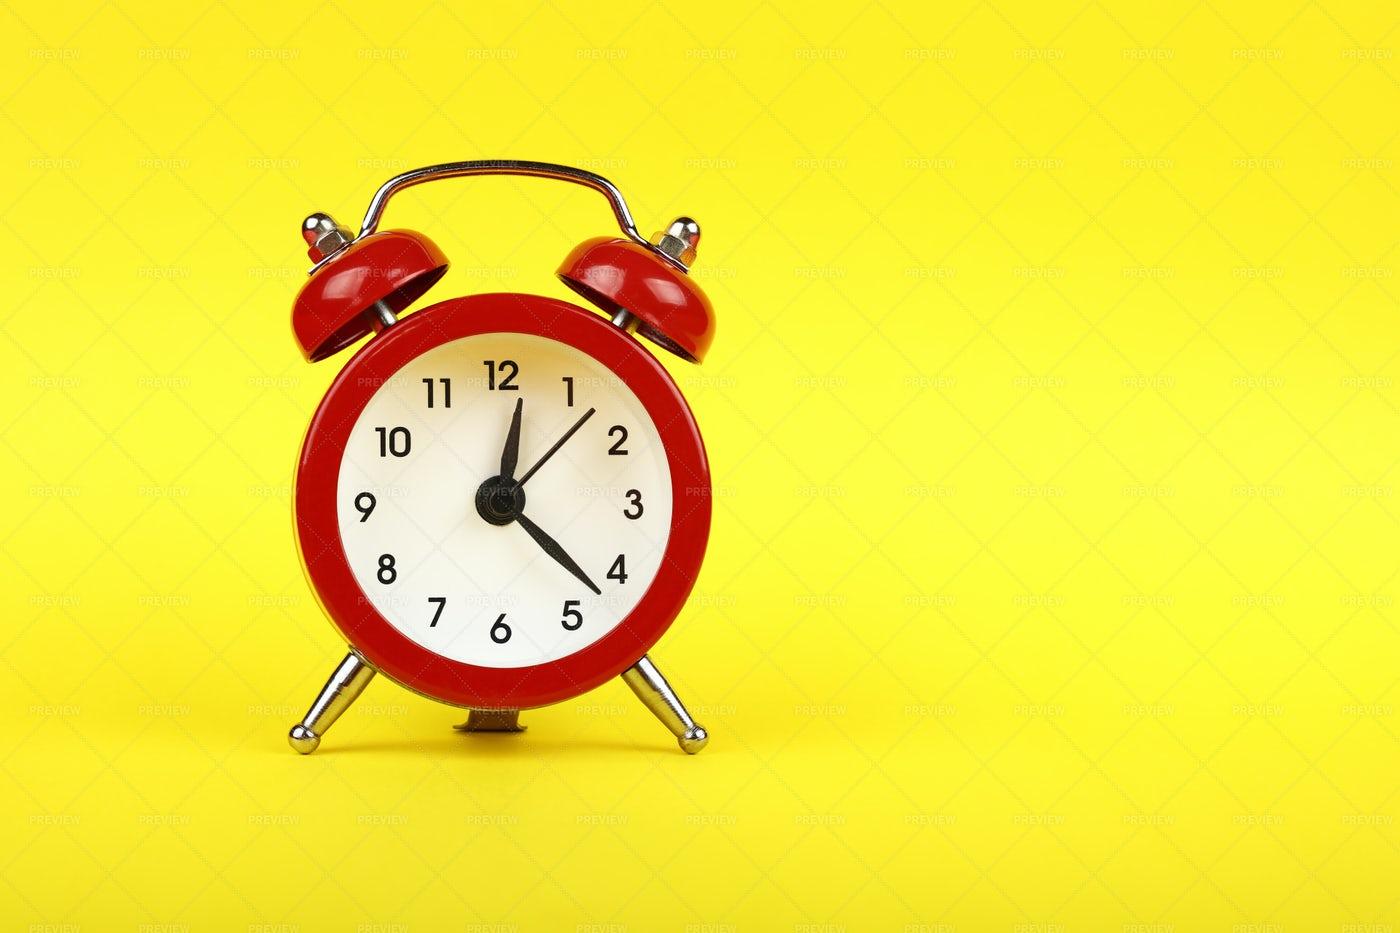 Red Alarm Clock On Yellow: Stock Photos